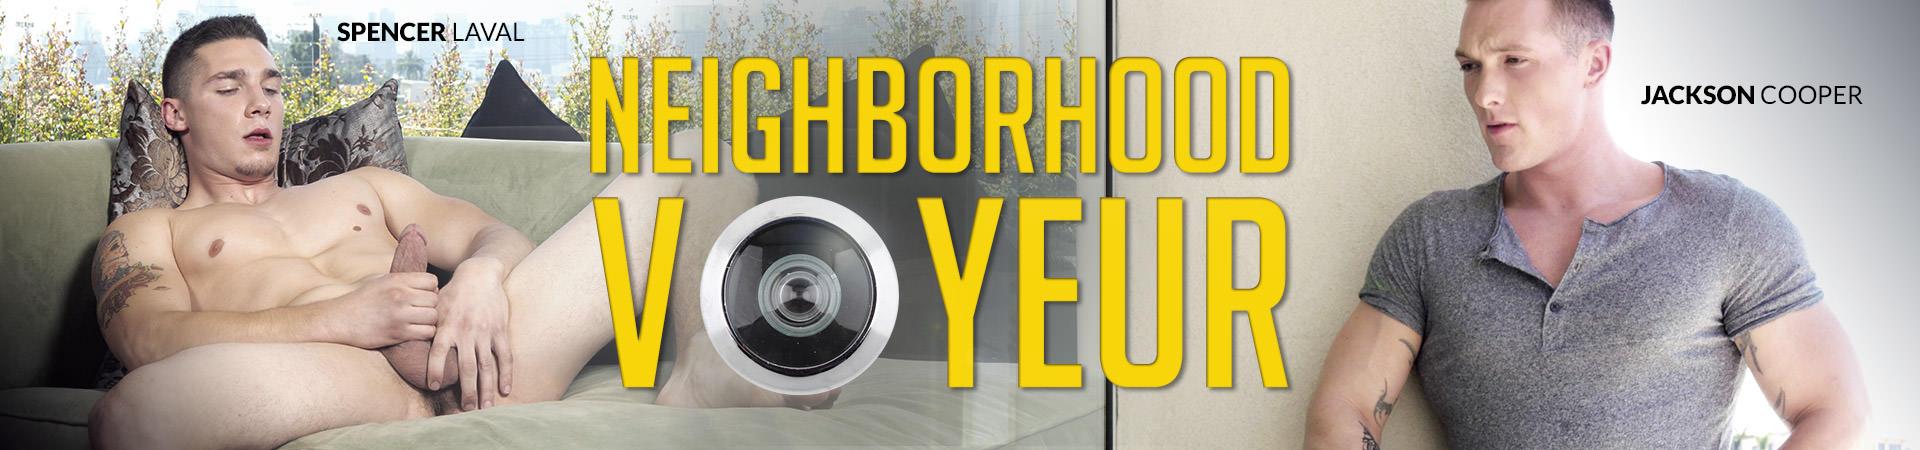 Neighborhood Voyeur Featuring Jackson Cooper and Spencer Laval